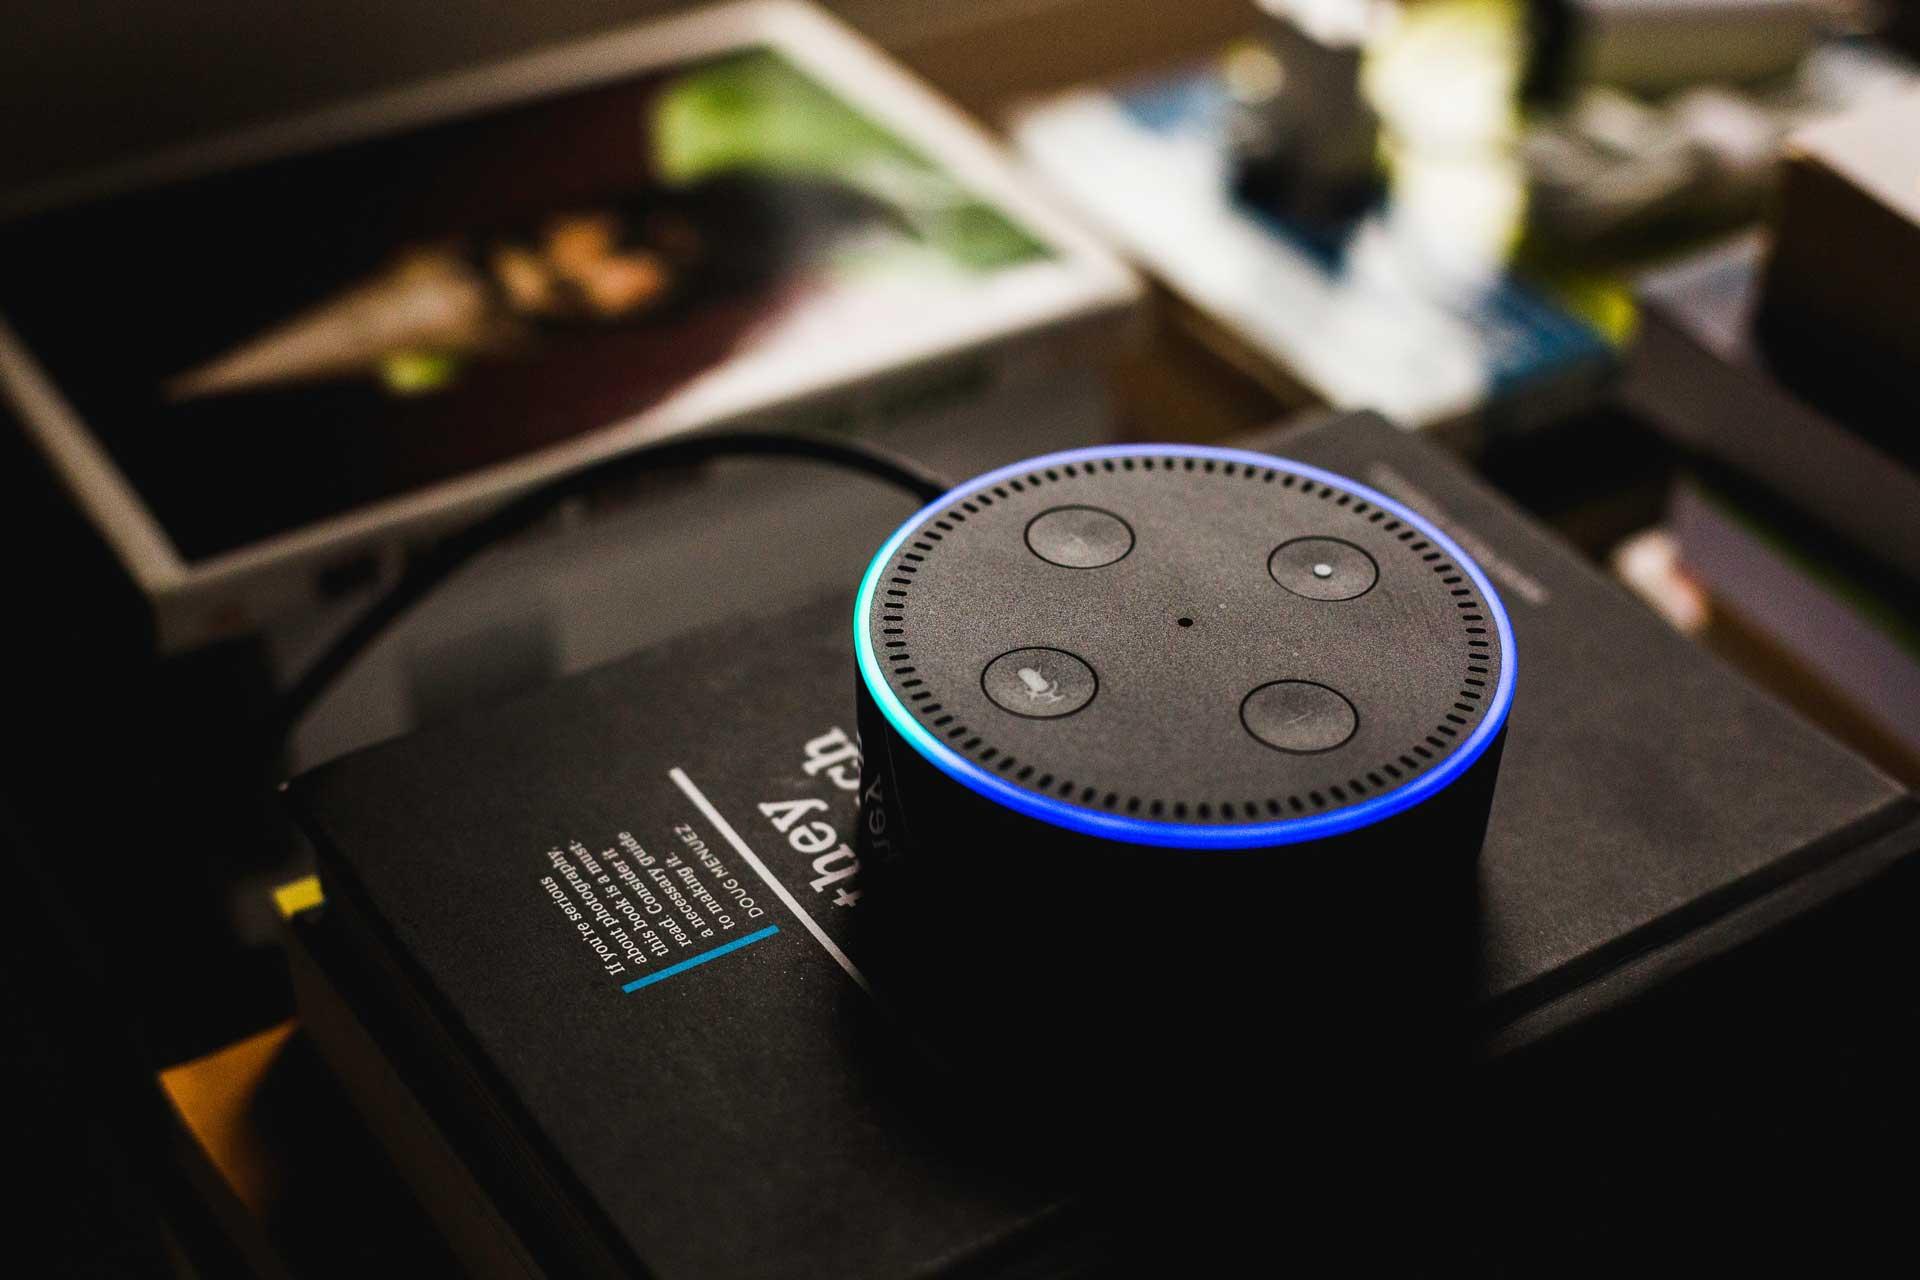 SEO services voice search for Alexa digital marketing website design Los Angeles